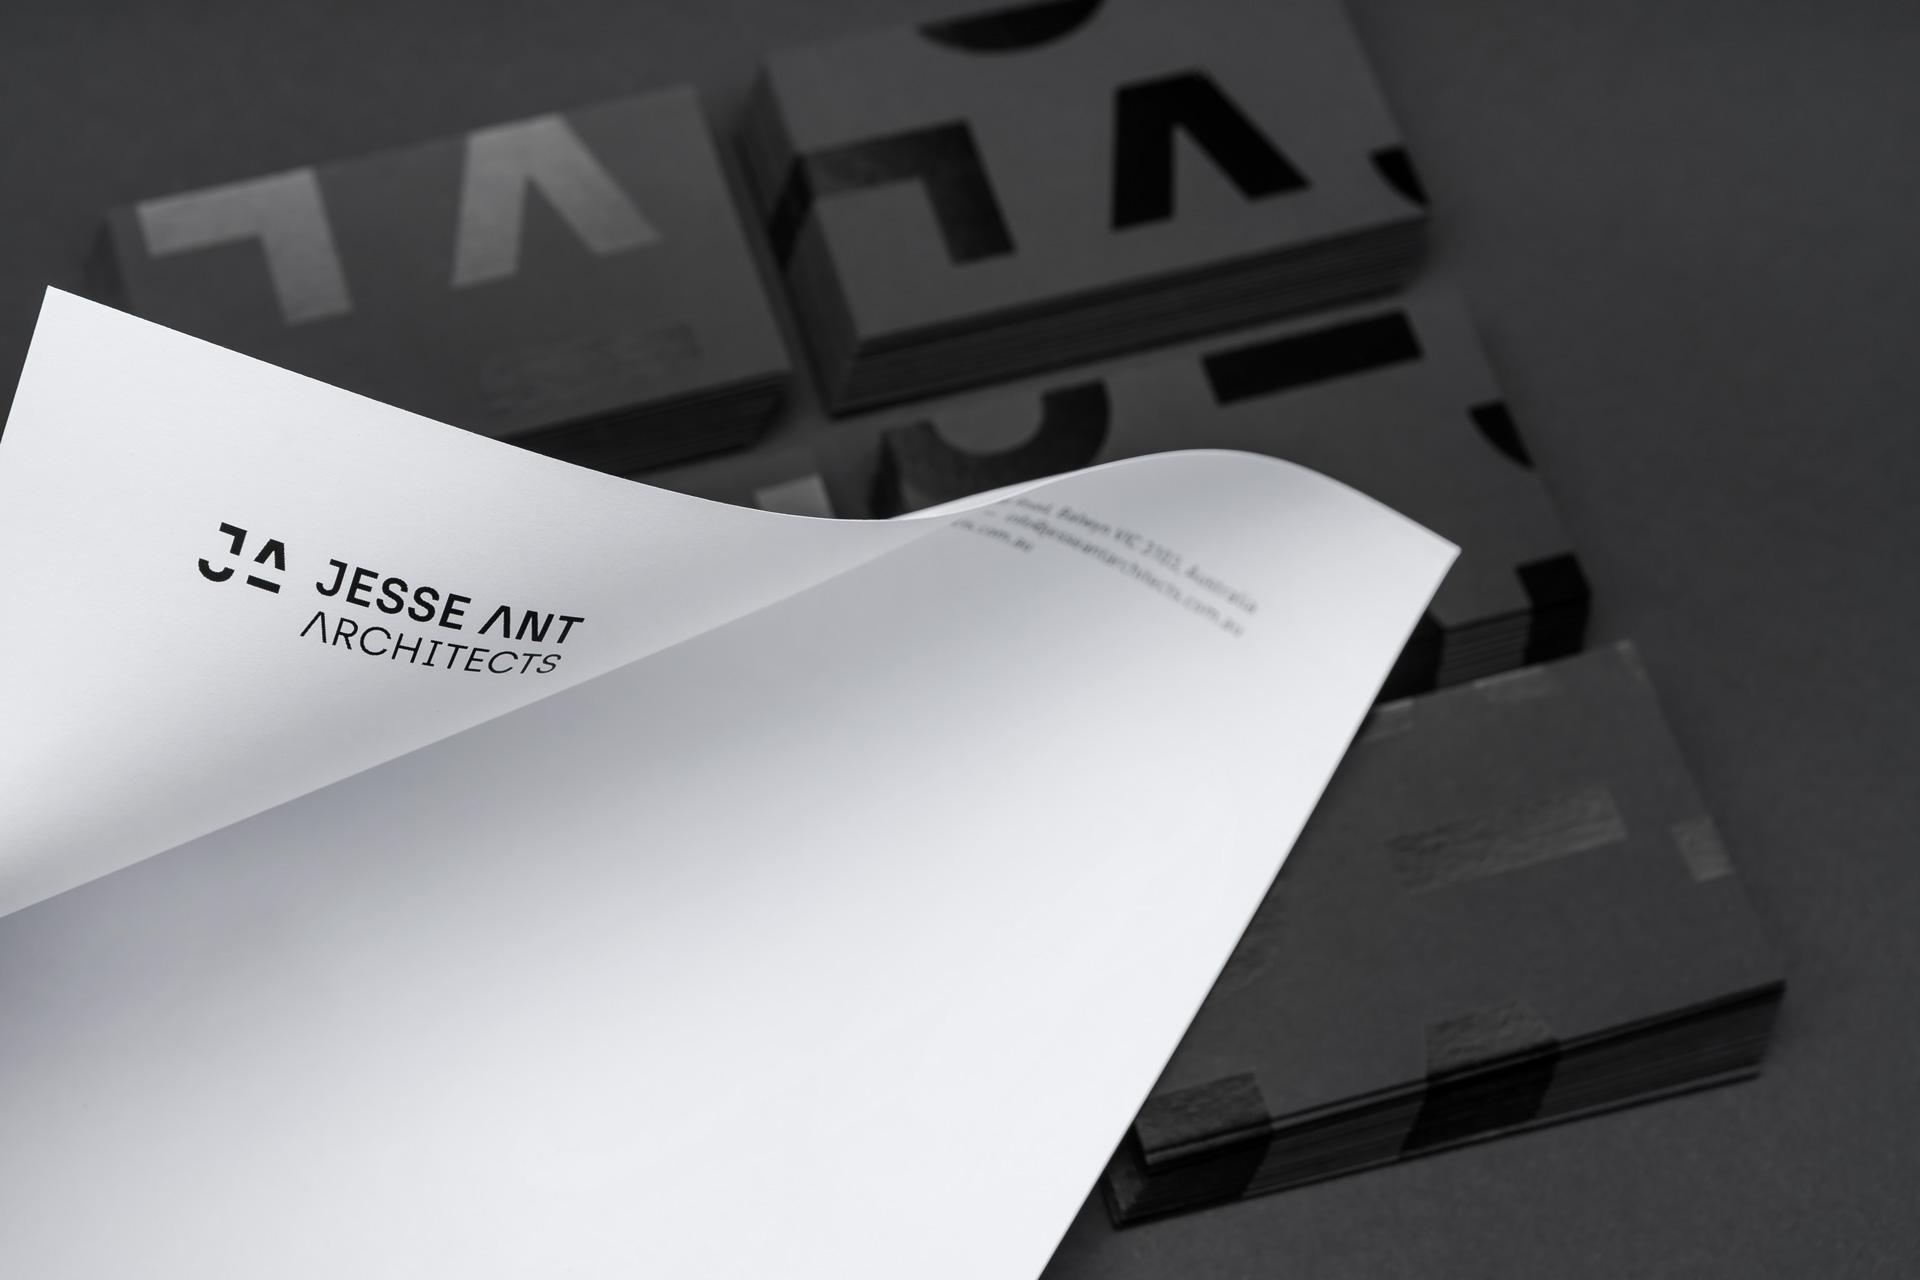 Jesse Ant Architects branding